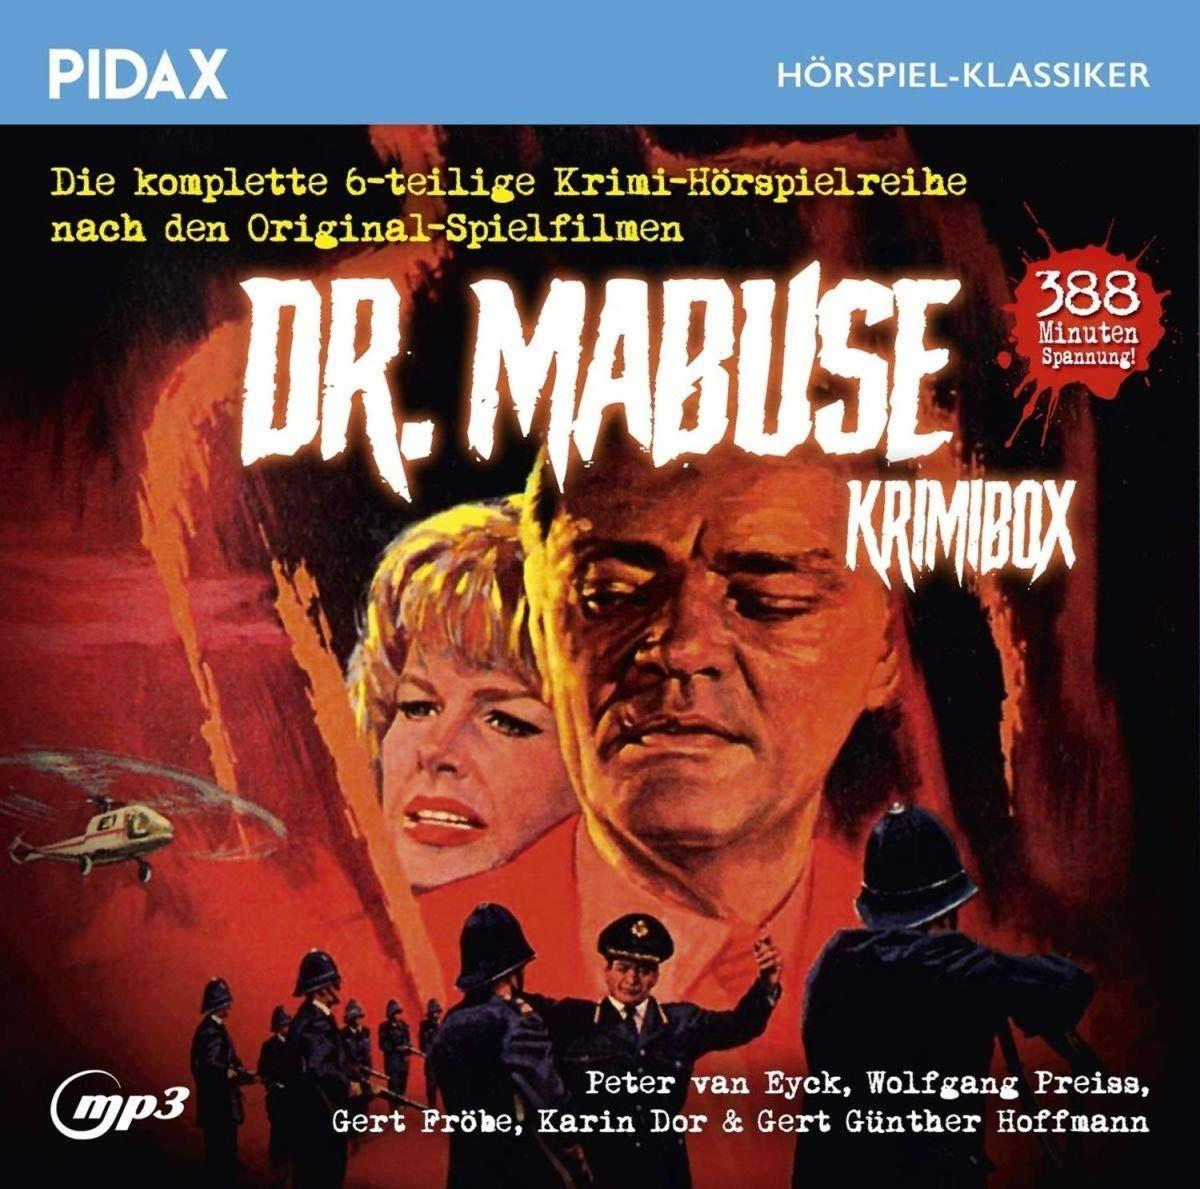 Pidax Hörspiel Klassiker - Dr. Mabuse - Krimibox